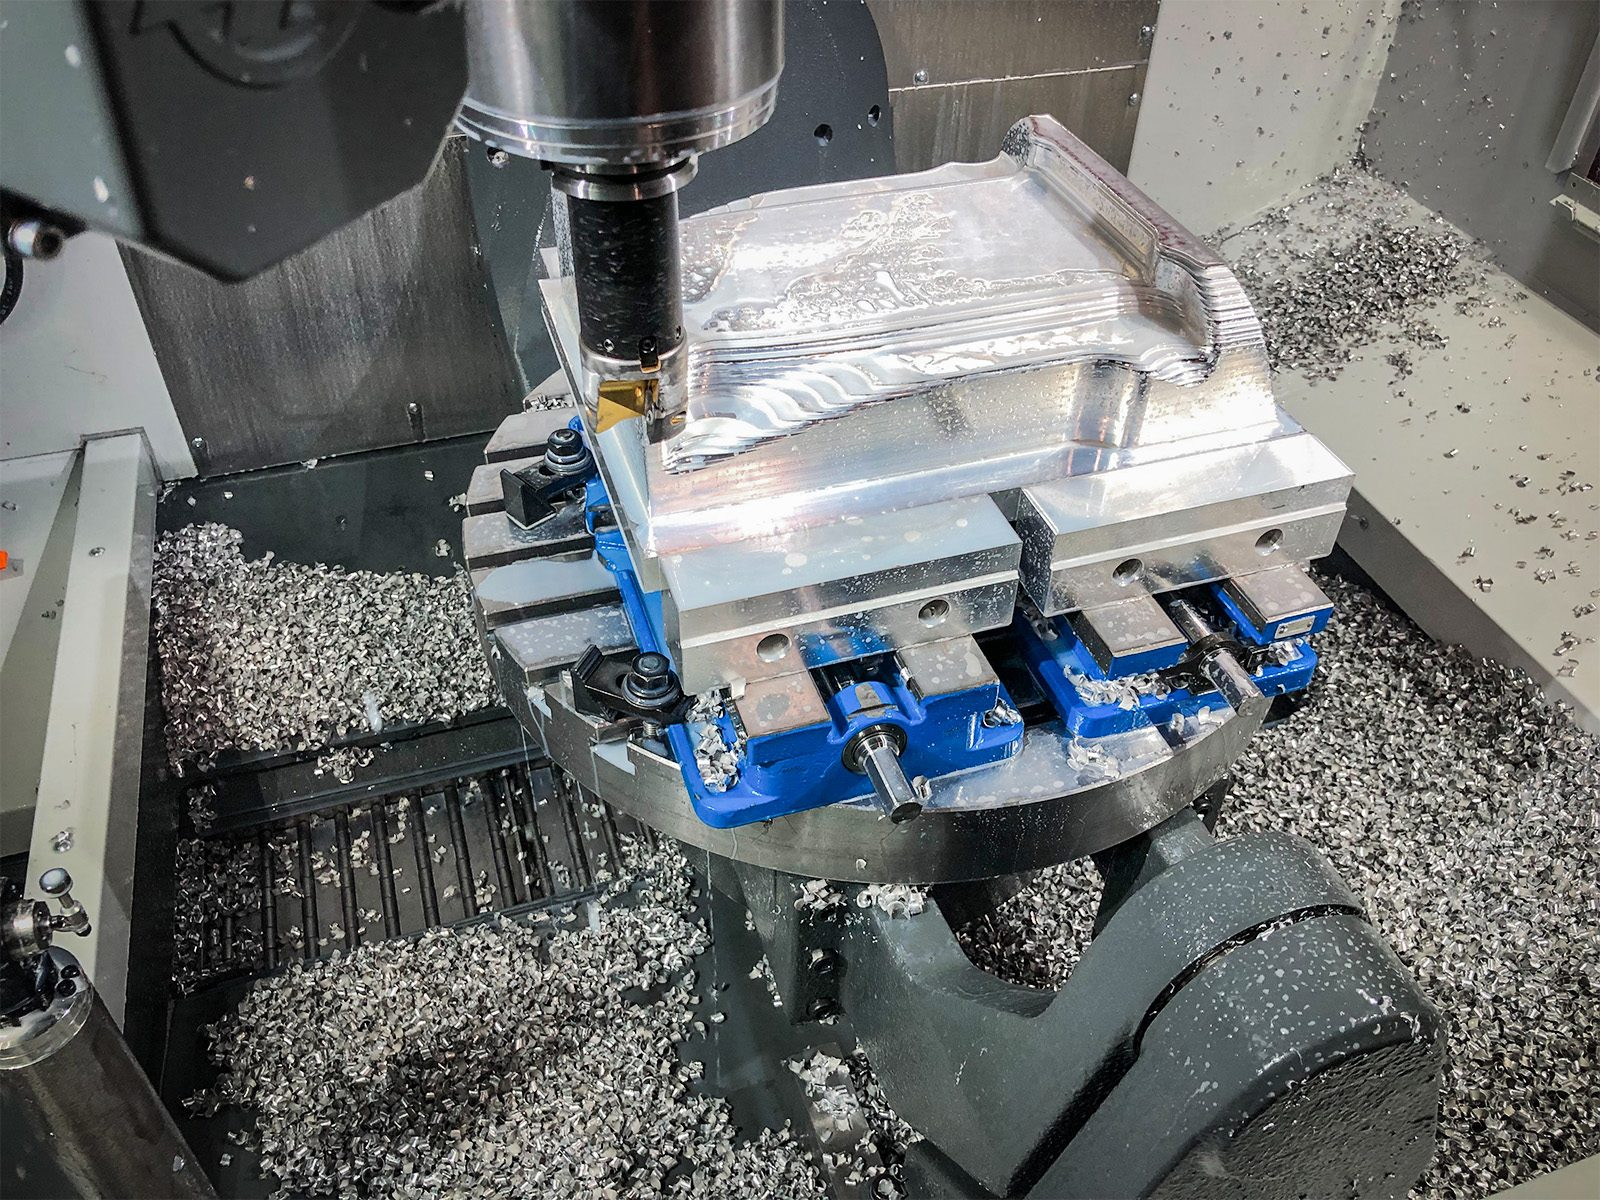 UMC-1000 | 5-Axis Mill | 40-Taper | Vertical Mills – Haas